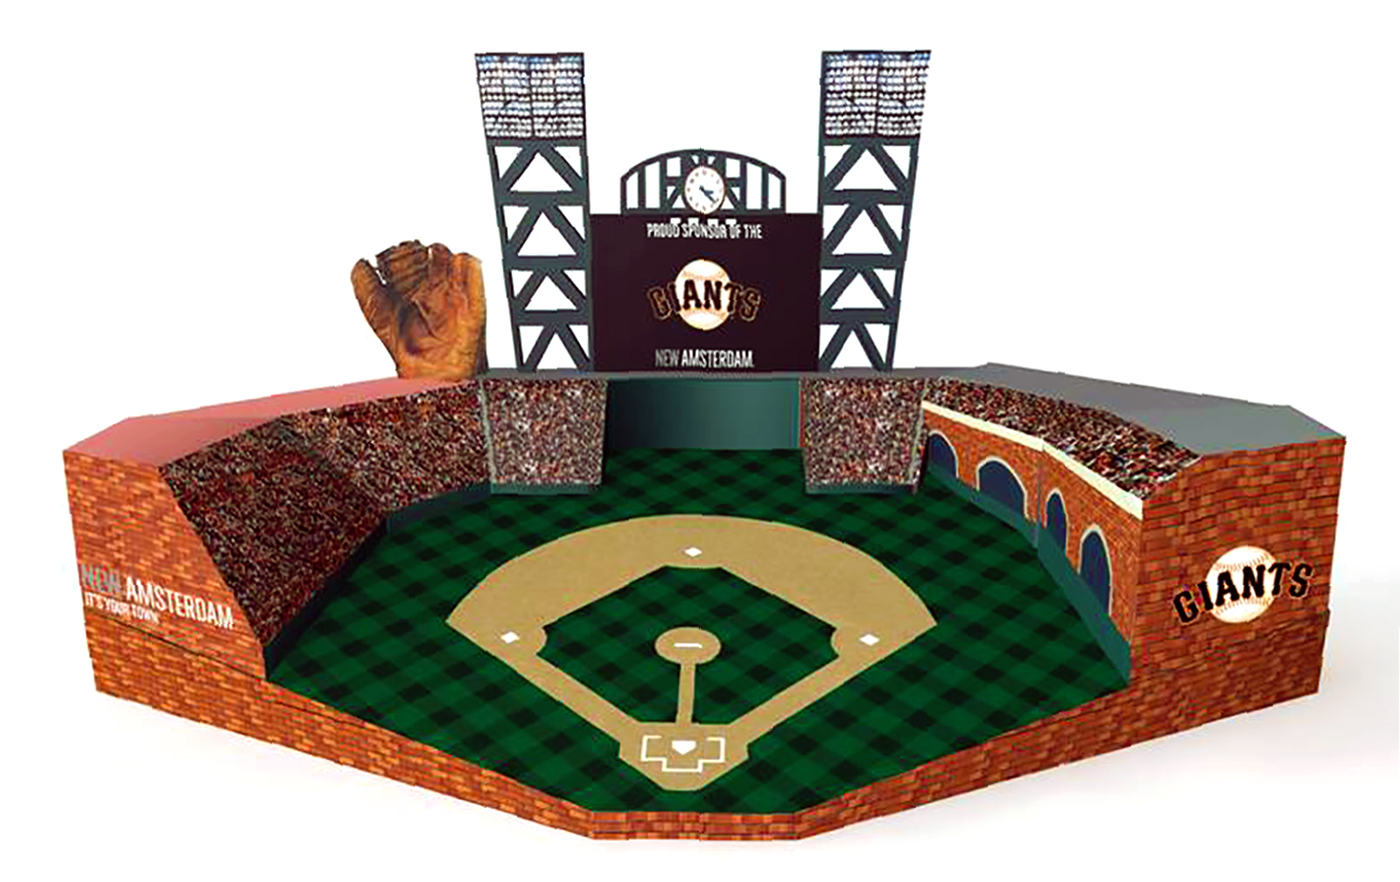 marketing elements,corrugate,baseball,alcohol,Spirits,structural design,conceptual design,dieline